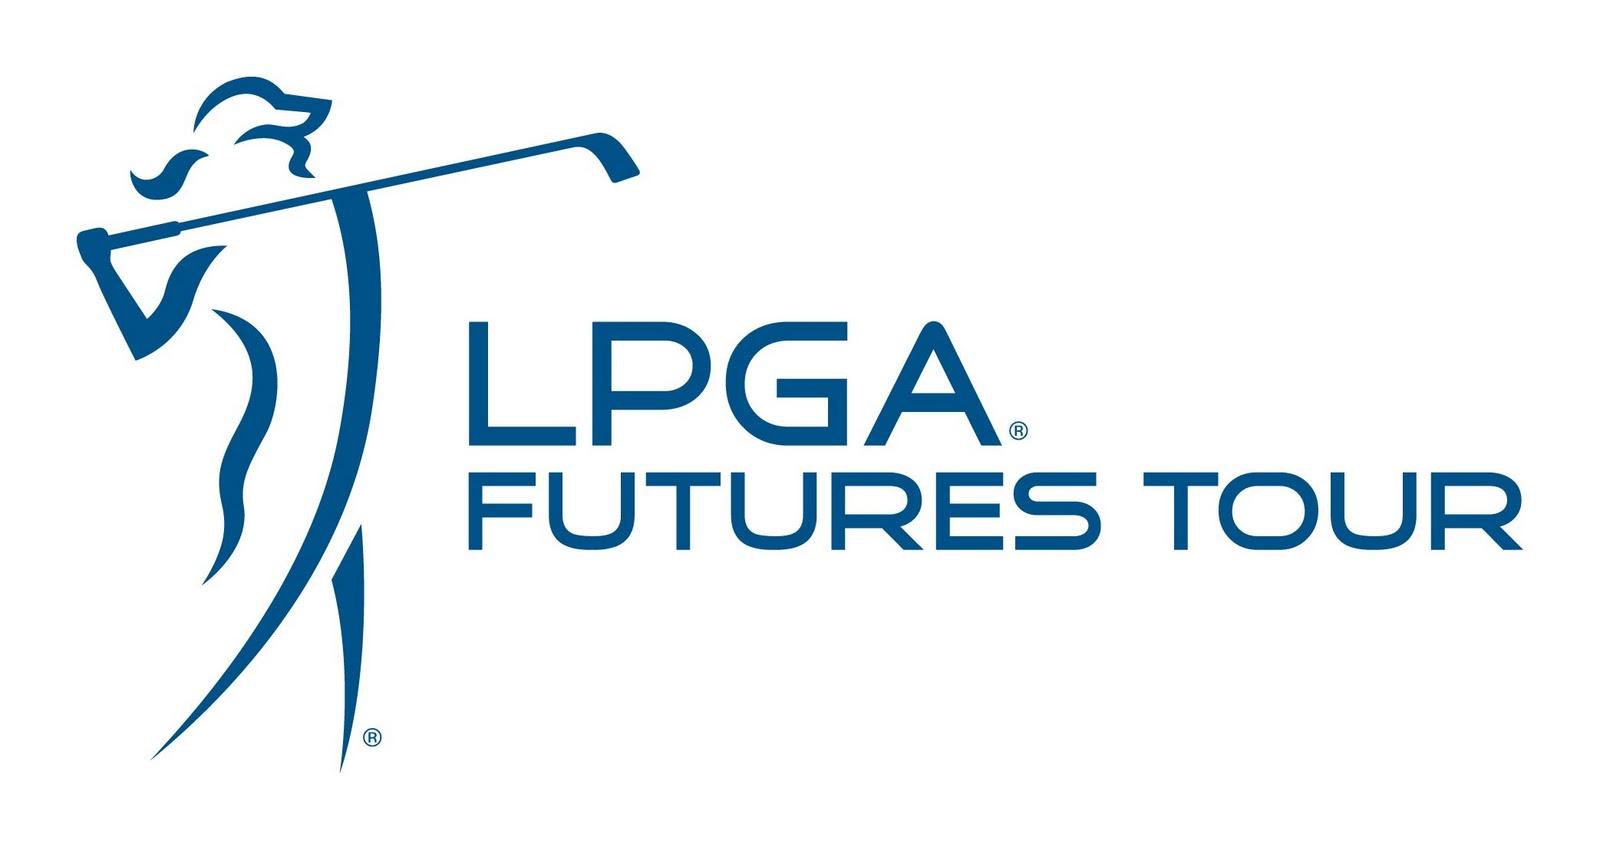 8 lpga ladies professional golf association logos tiwula